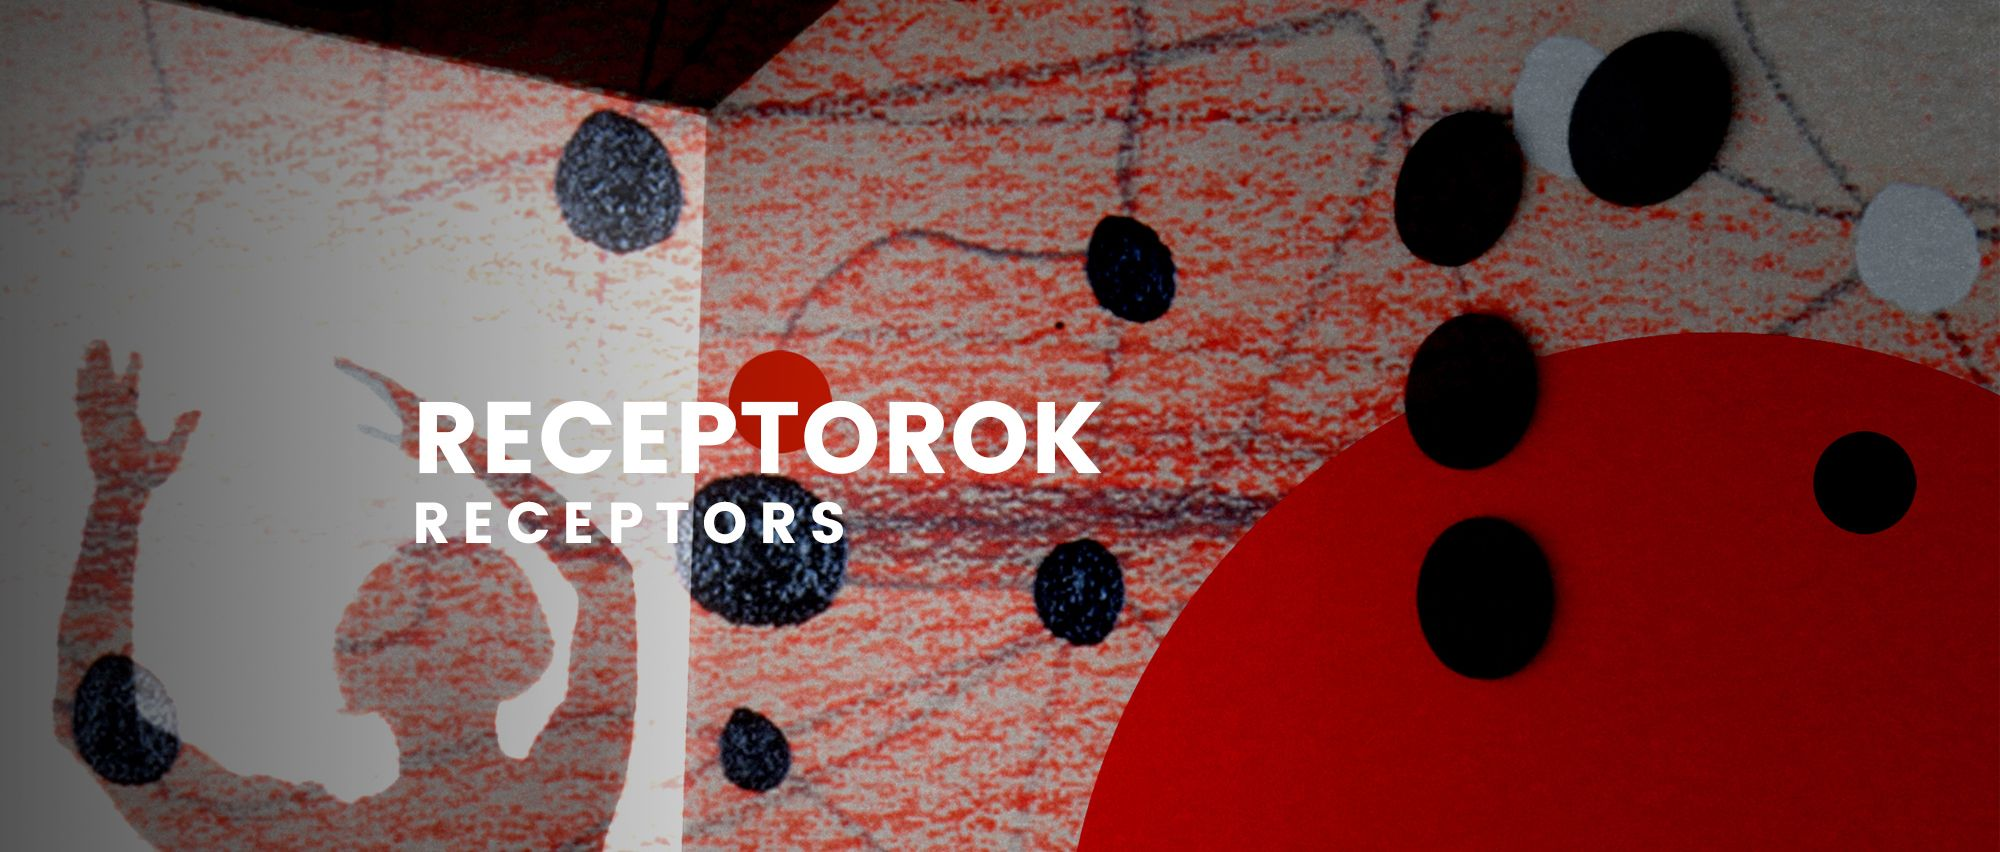 Receptorok